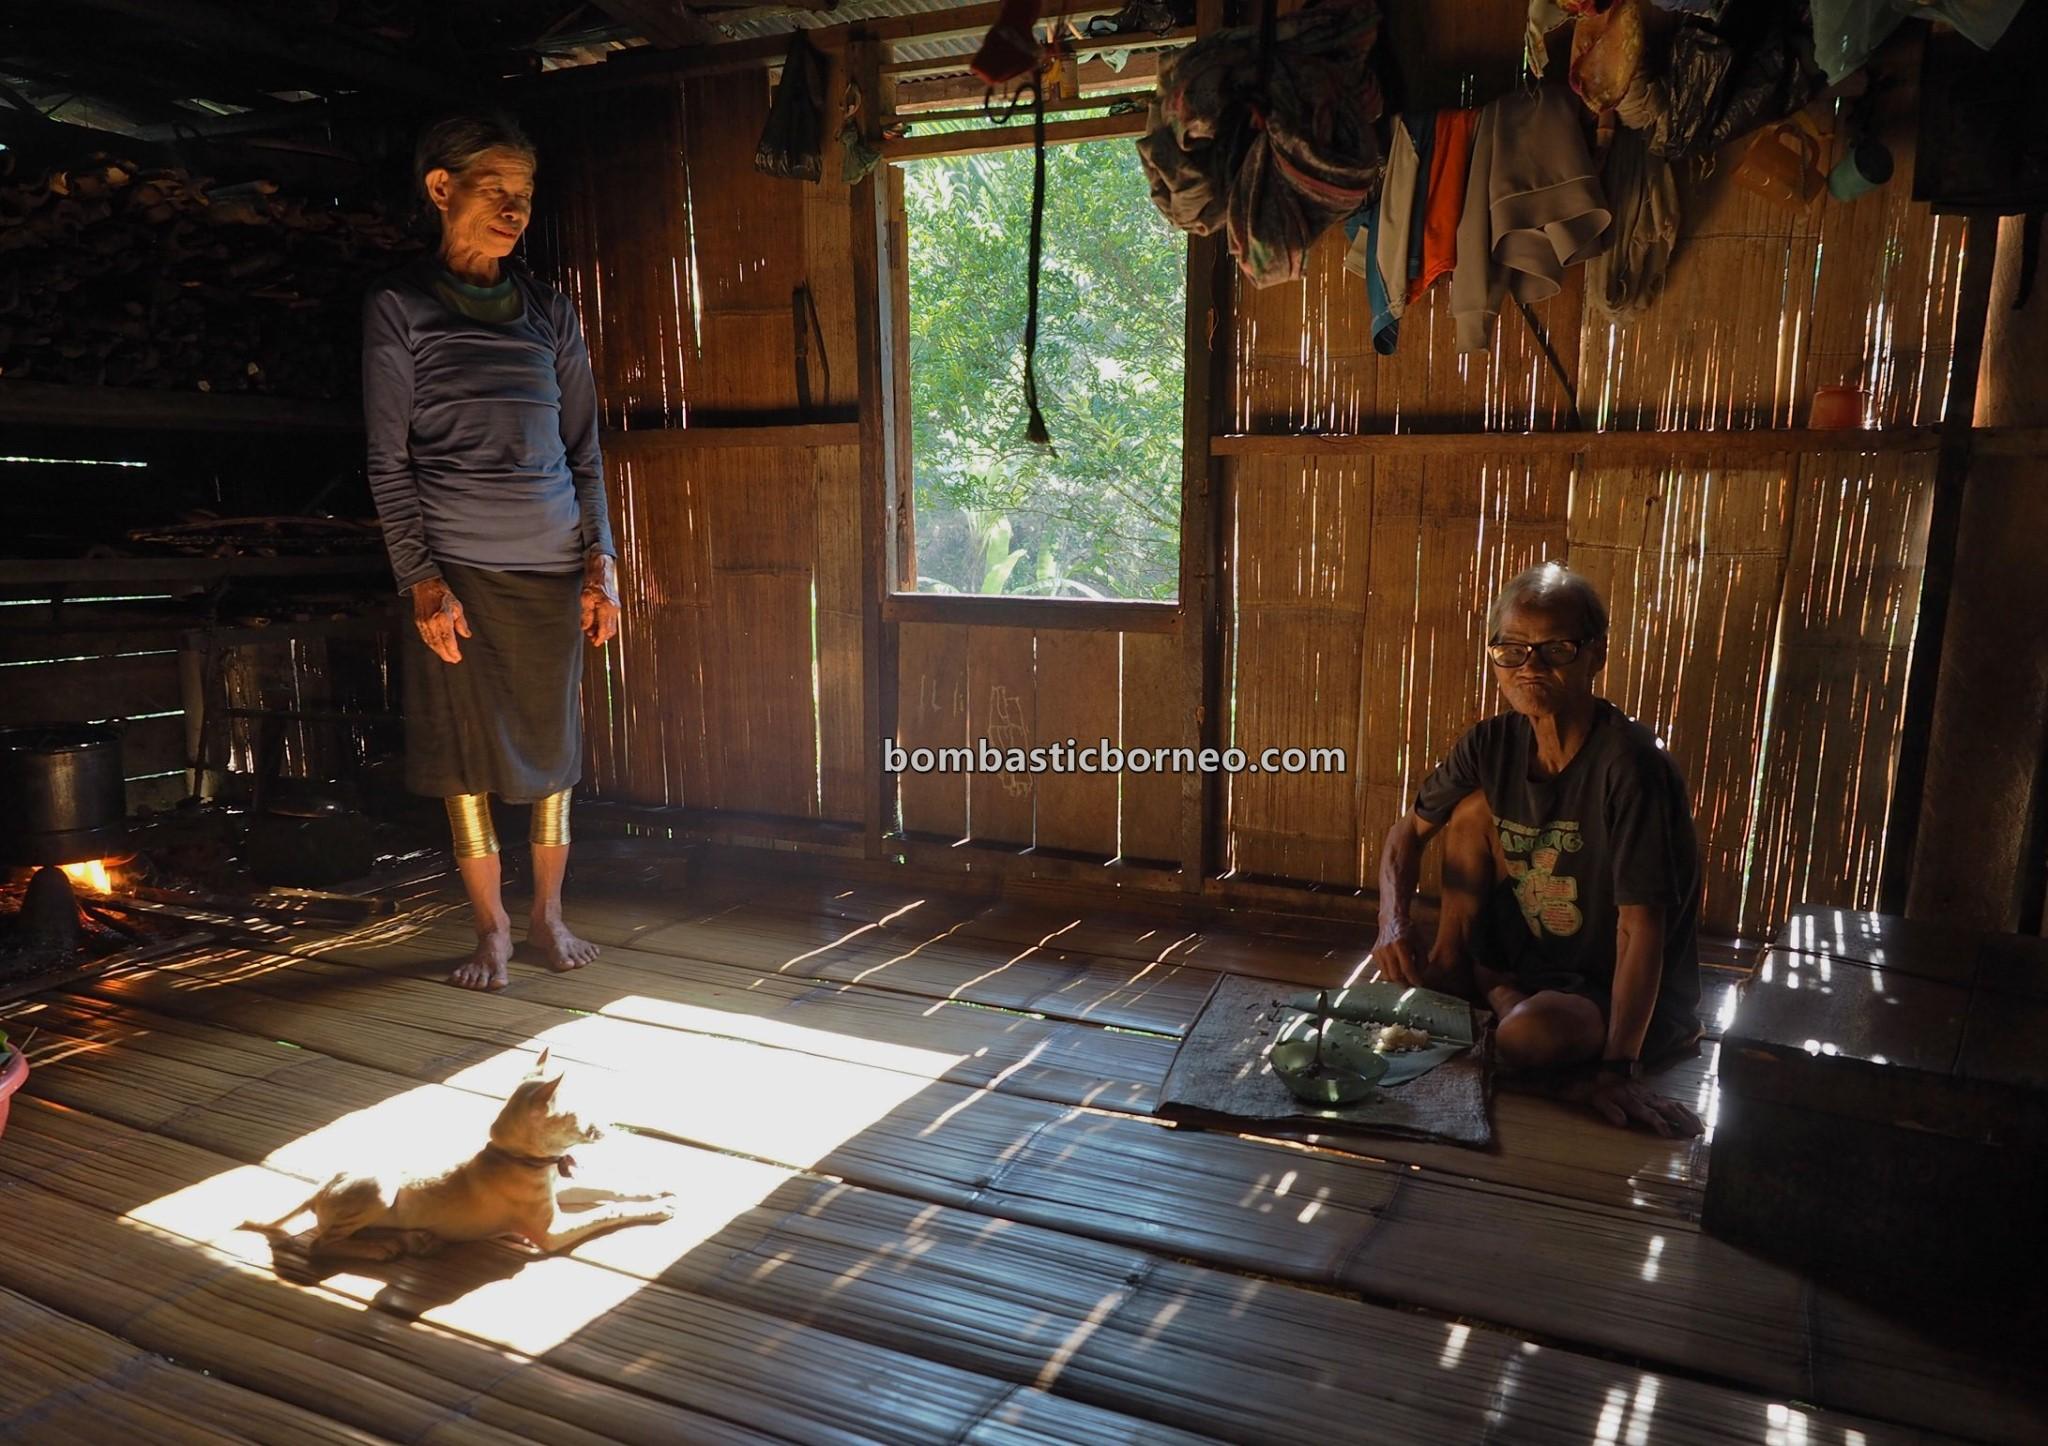 Copper Ring Lady, Sungkung Medeng, traditional, indigenous, Bengkayang, Indonesia, Kalimantan Barat, native, Dayak Bidayuh, tribal, village, Tourism, tourist attraction, Travel guide, Trans Border, Borneo